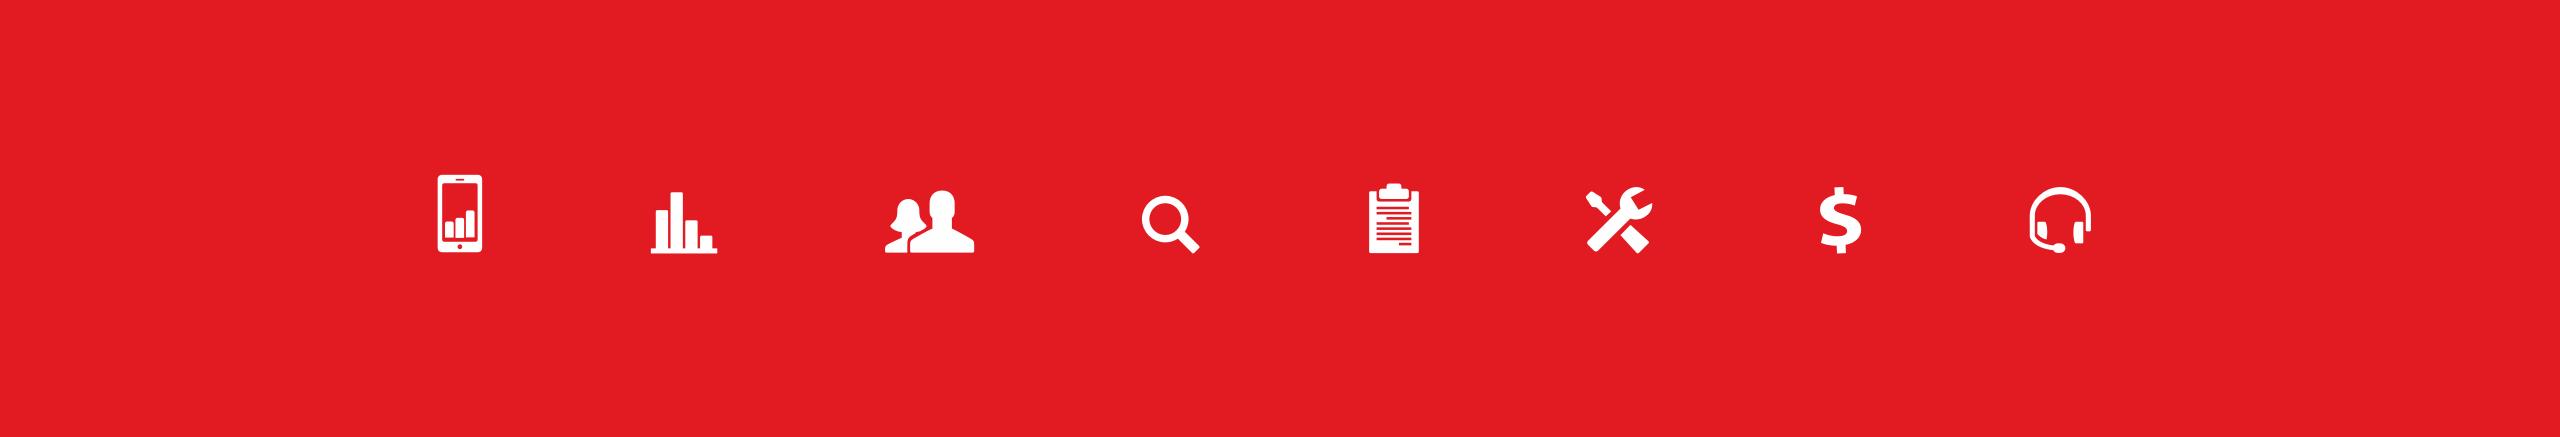 management_icons